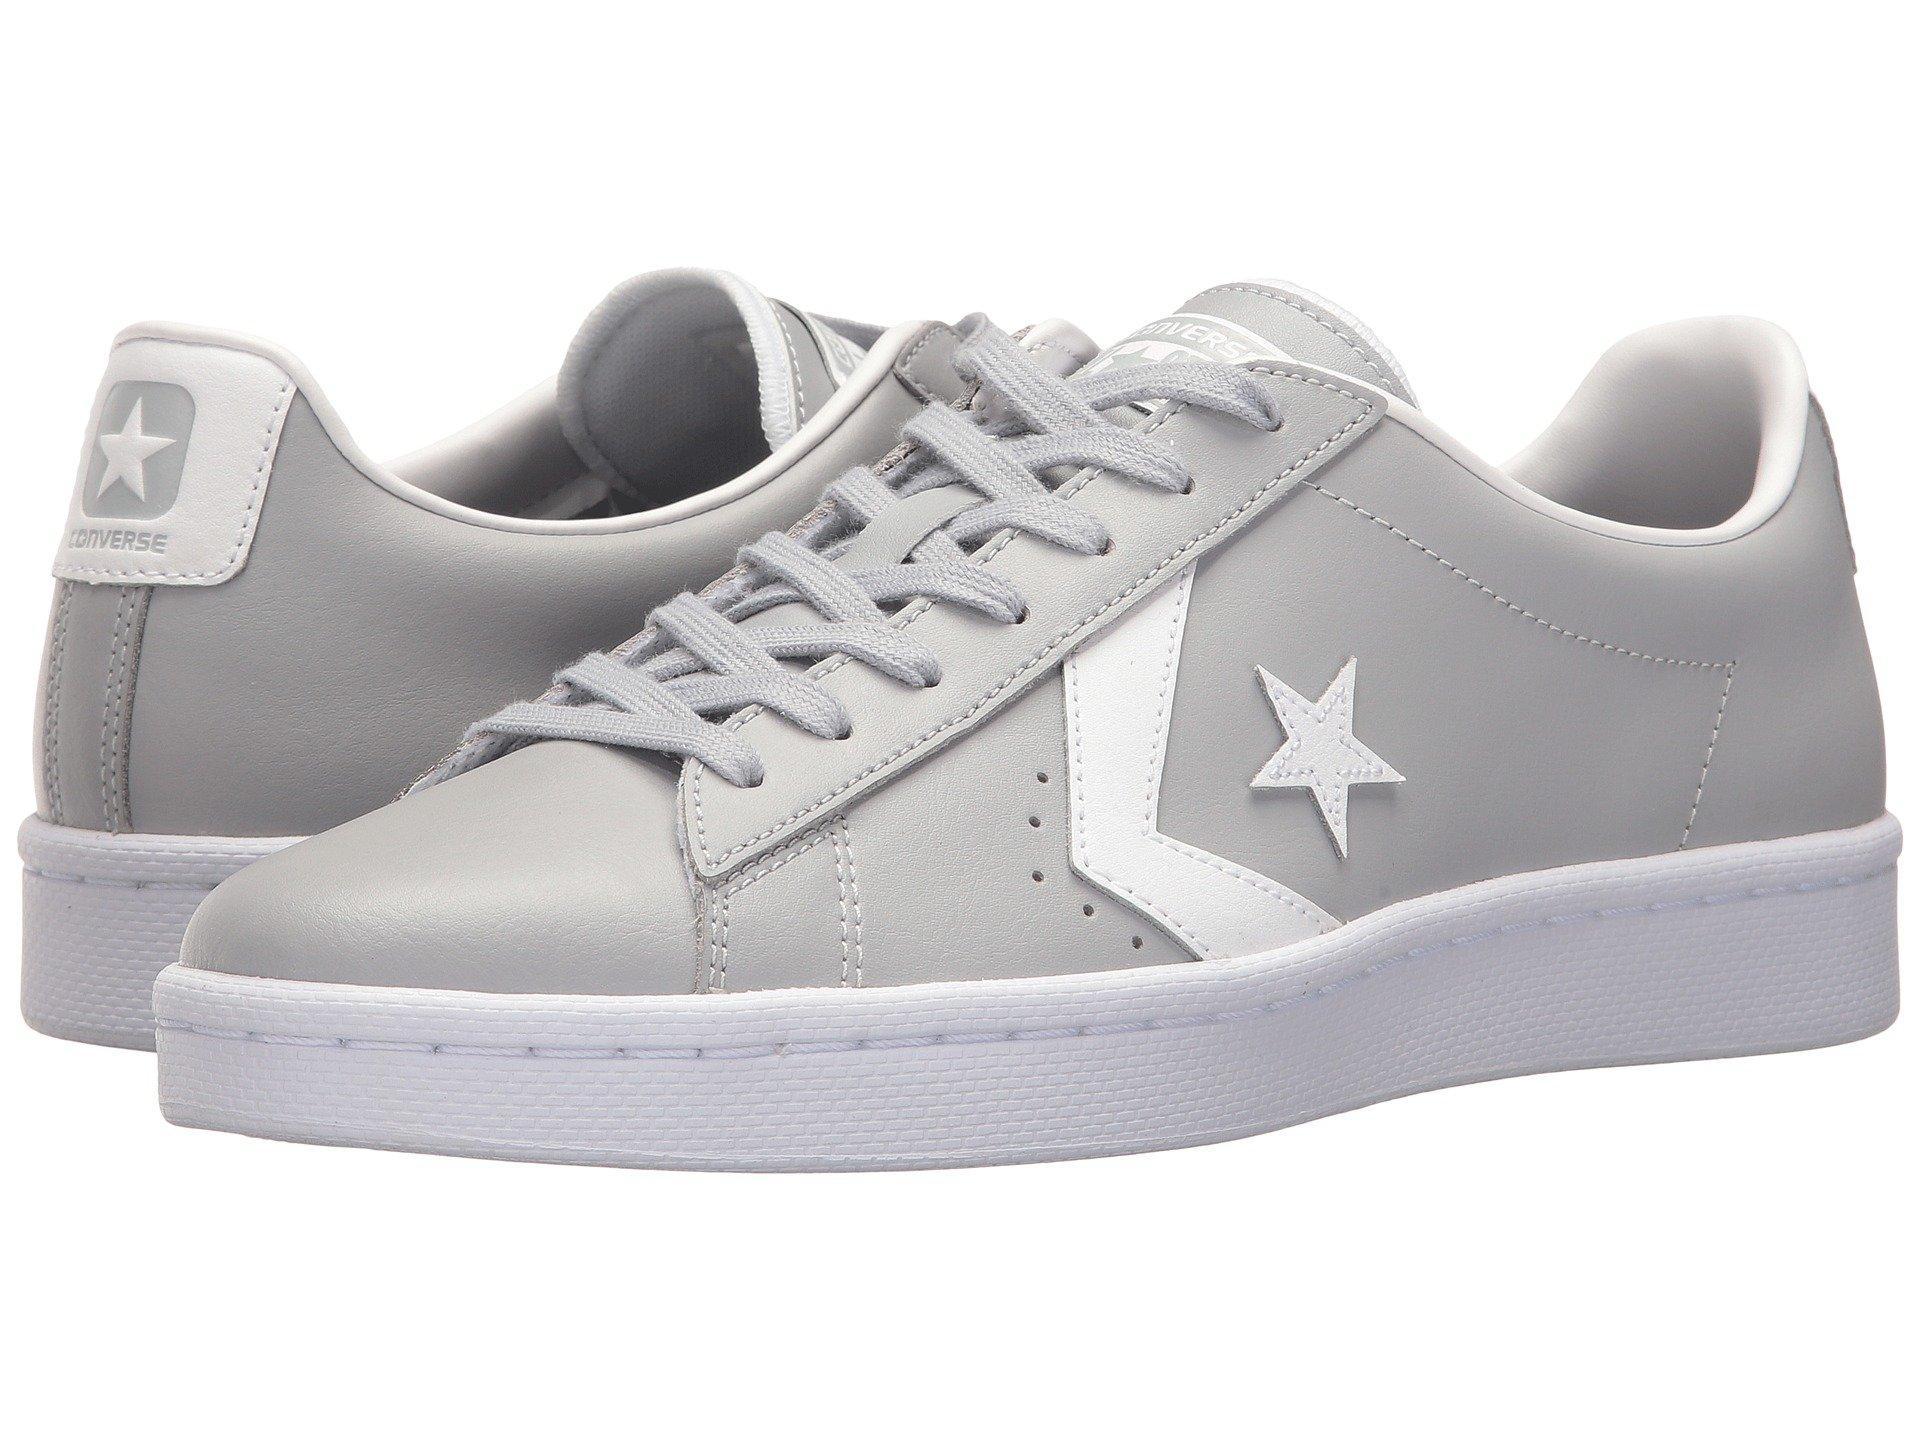 Converse Pl 76 - Ox In Wolf Grey/white/white   ModeSens